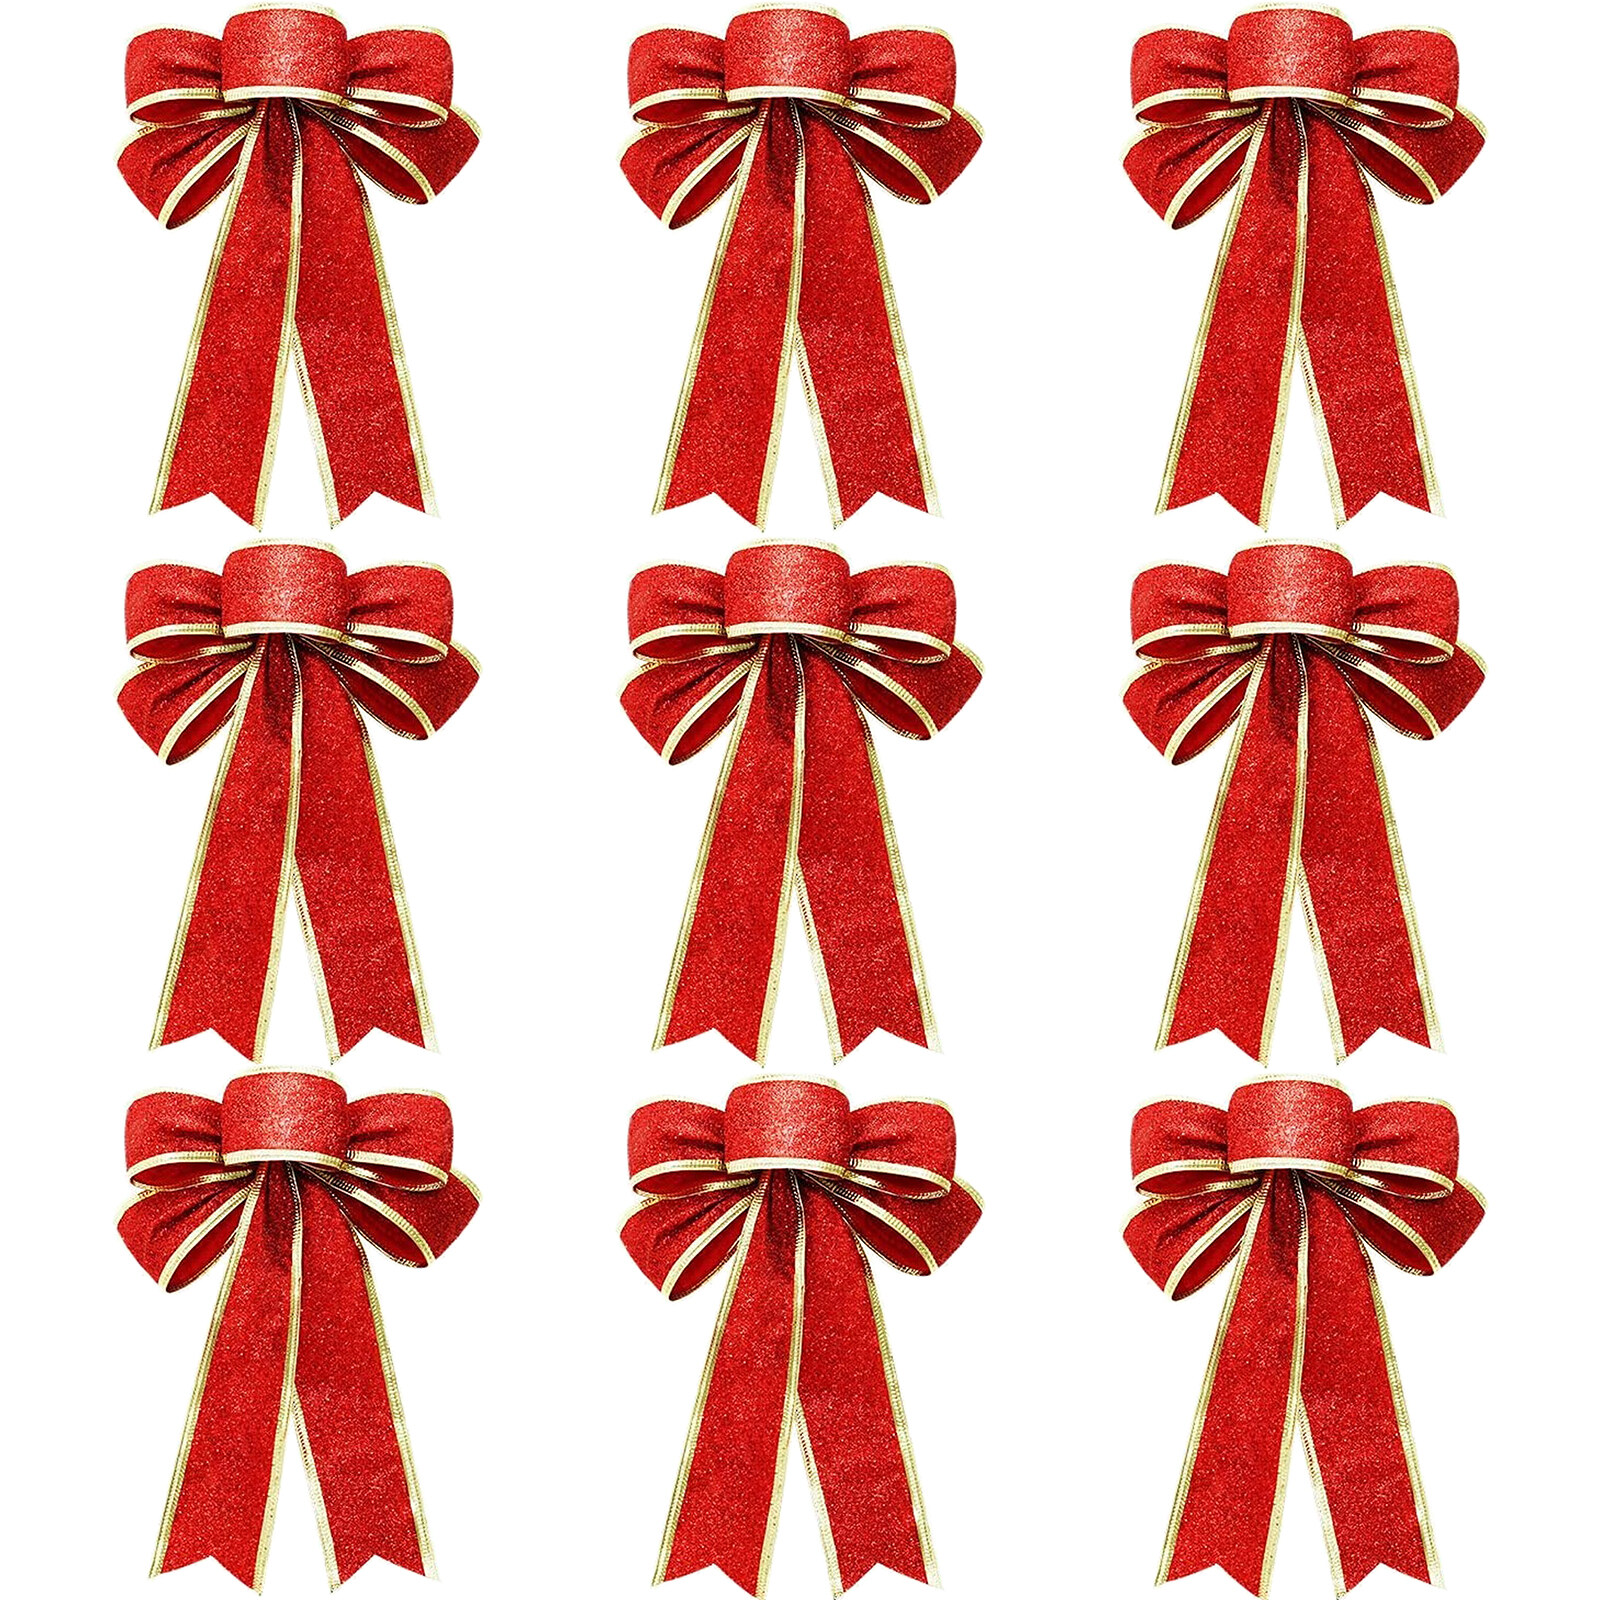 Hebeanna 9pcs Christmas Bows 5 Loop Red Ribbon Bows Christmas Wrapping Wreath Bow For Xmas Decoration Christmas Tree Crafts Diy Bow Decoration Wrapping Supplies Red Lazada Ph